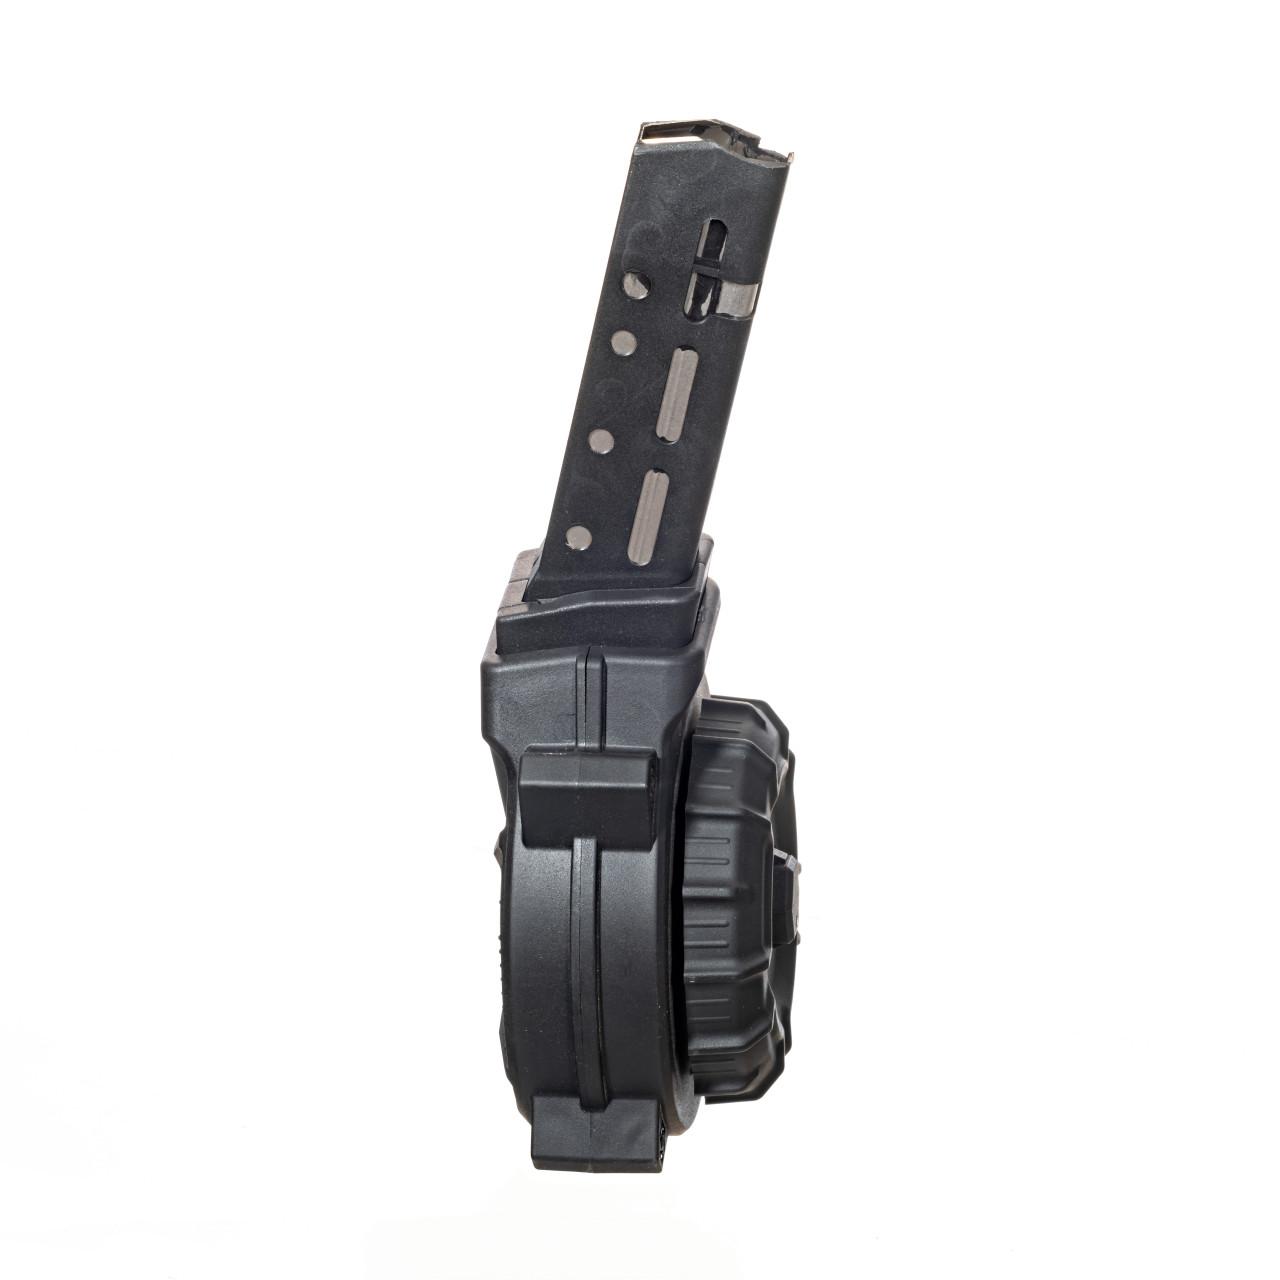 Fits Glock®  Model 21 / 30  .45 ACP (40) Rd Drum - Black Polymer